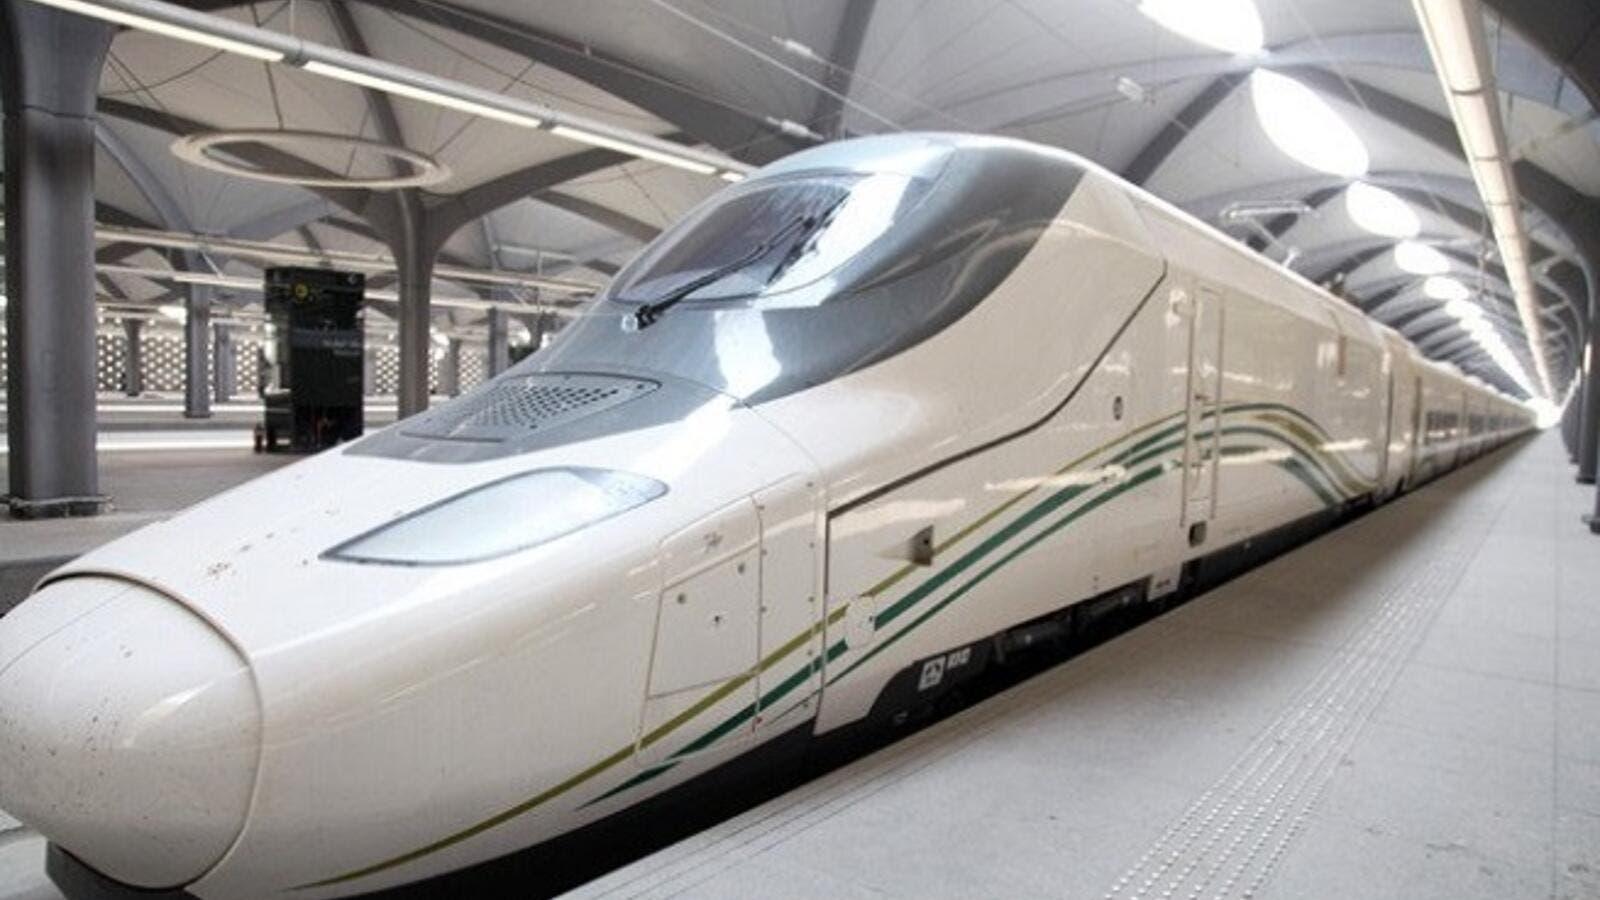 KSA's Haramain Train Makes First Free Trip With 200 Citizens